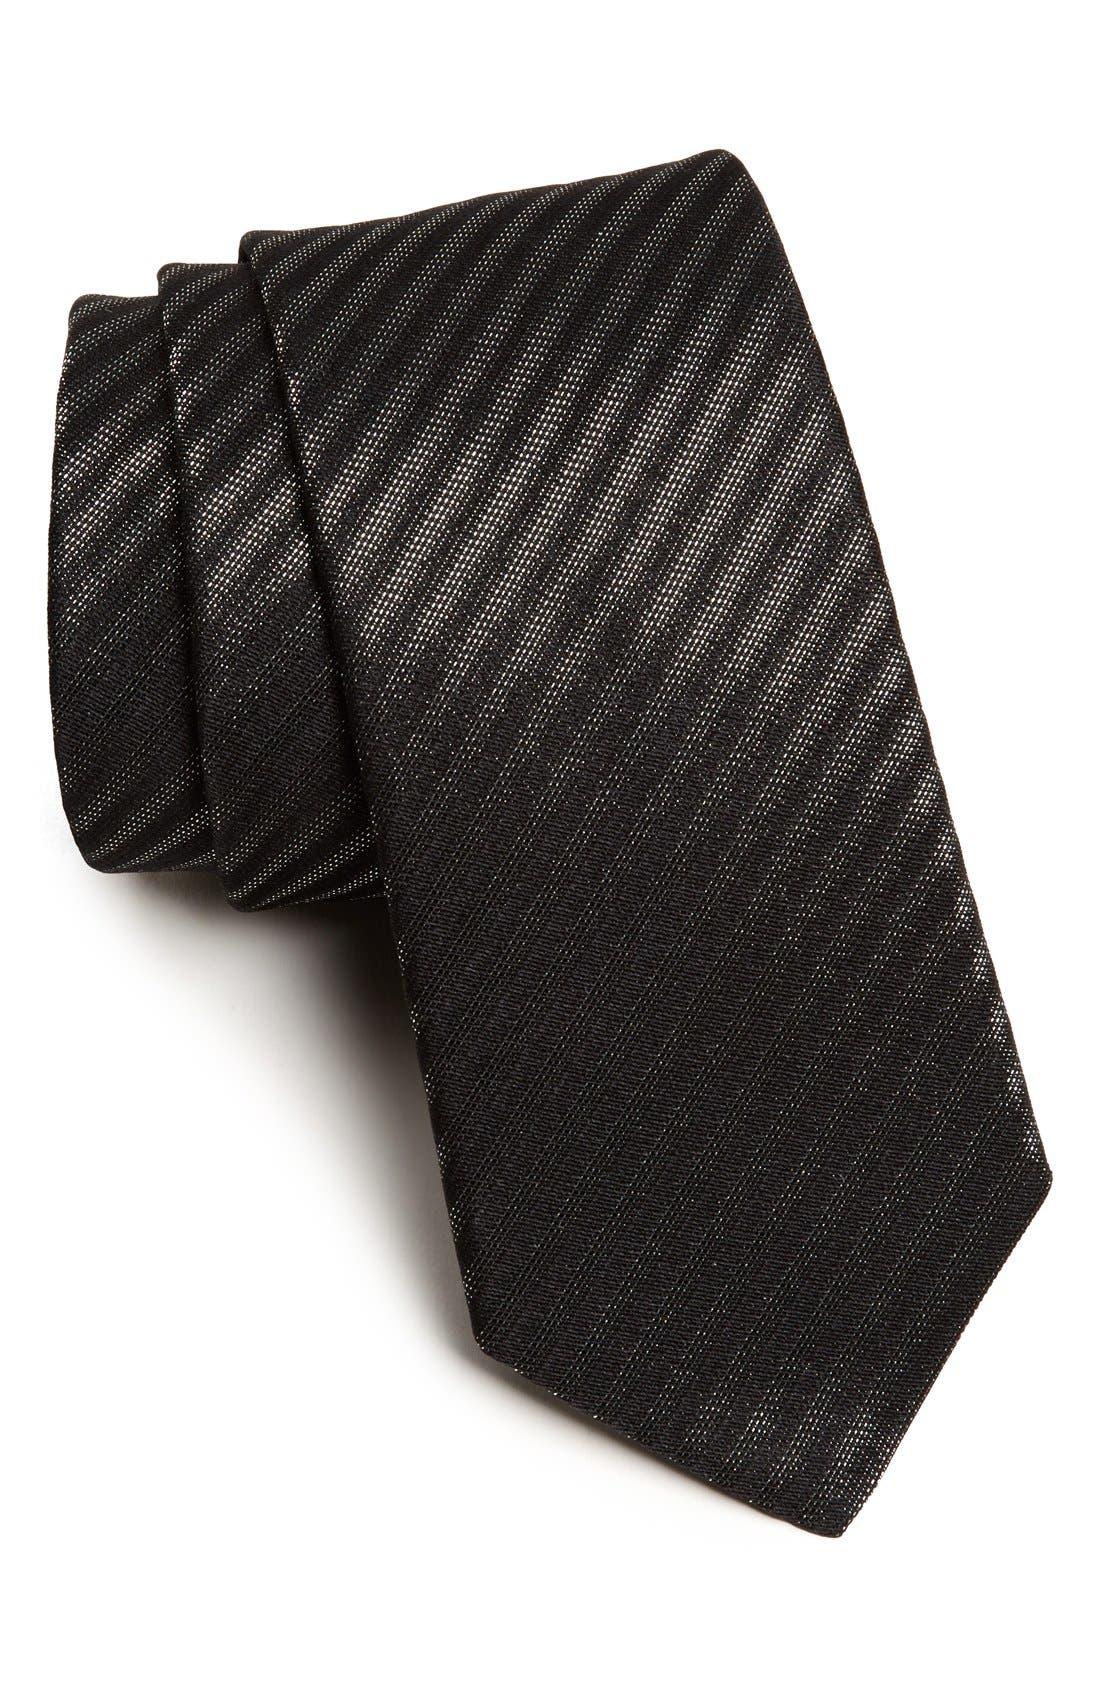 Main Image - Yves Saint Laurent Woven Silk Blend Tie